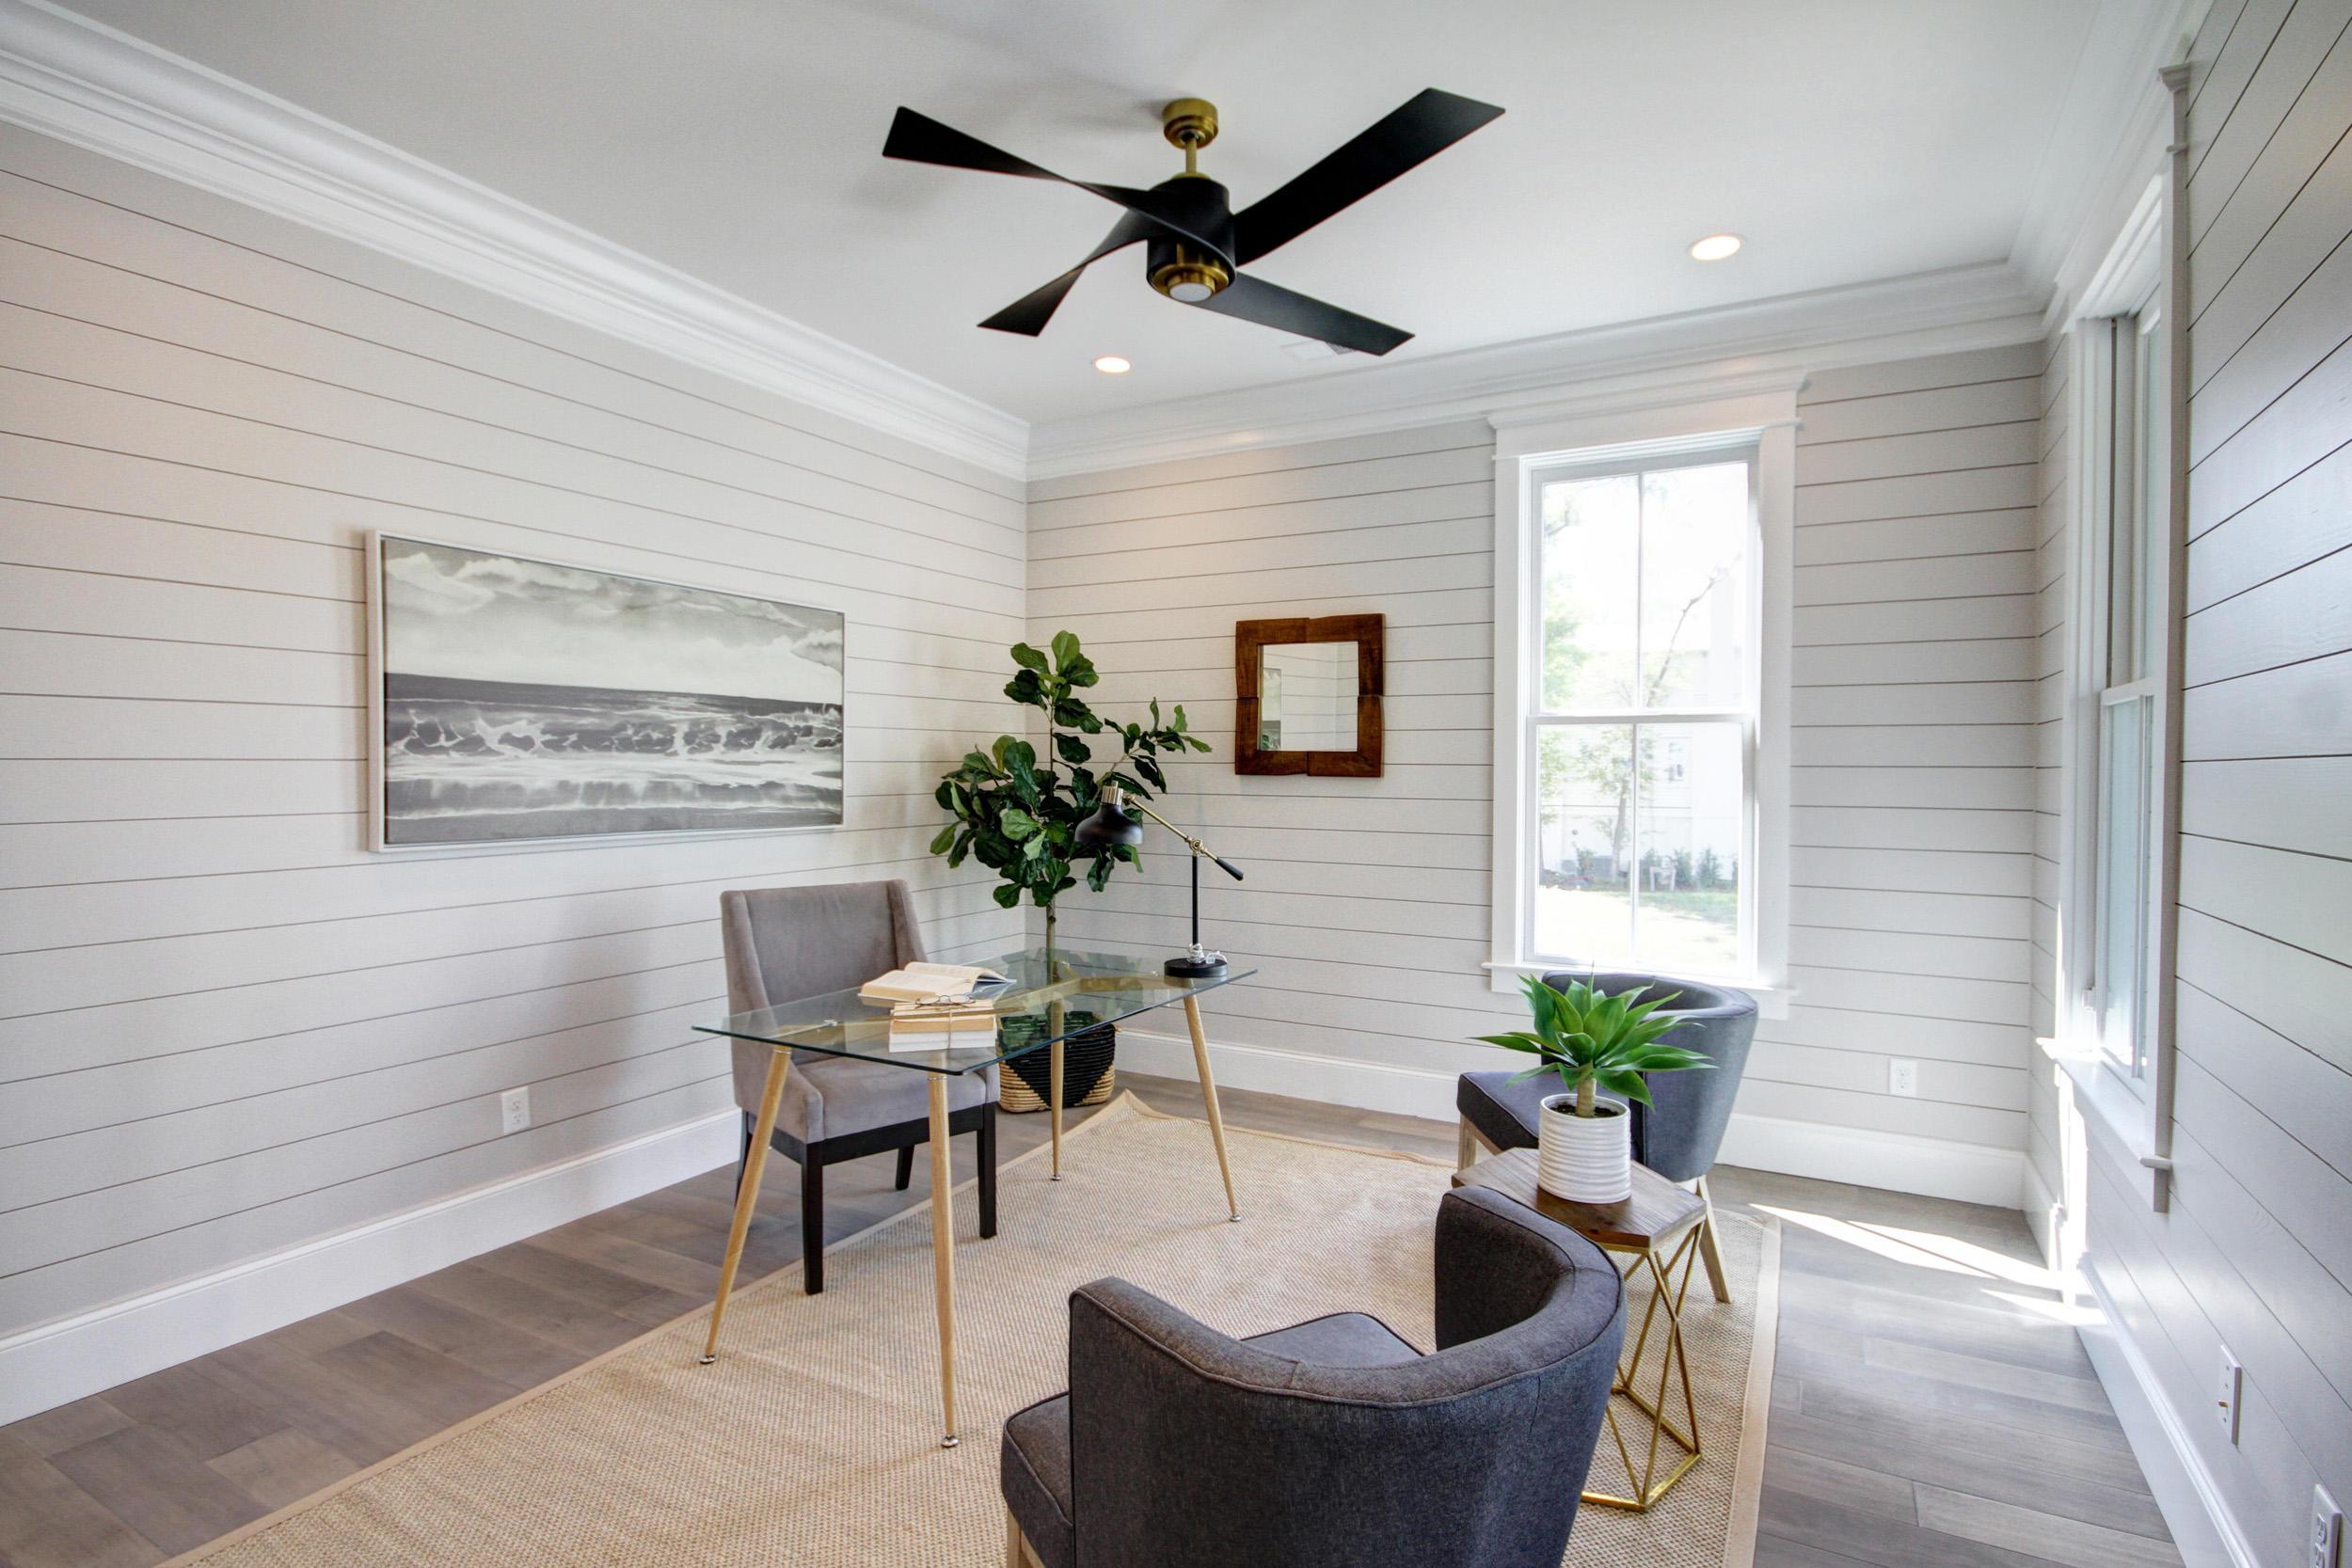 Mathis Ferry Court Homes For Sale - 1212 Clonmel Place, Mount Pleasant, SC - 17